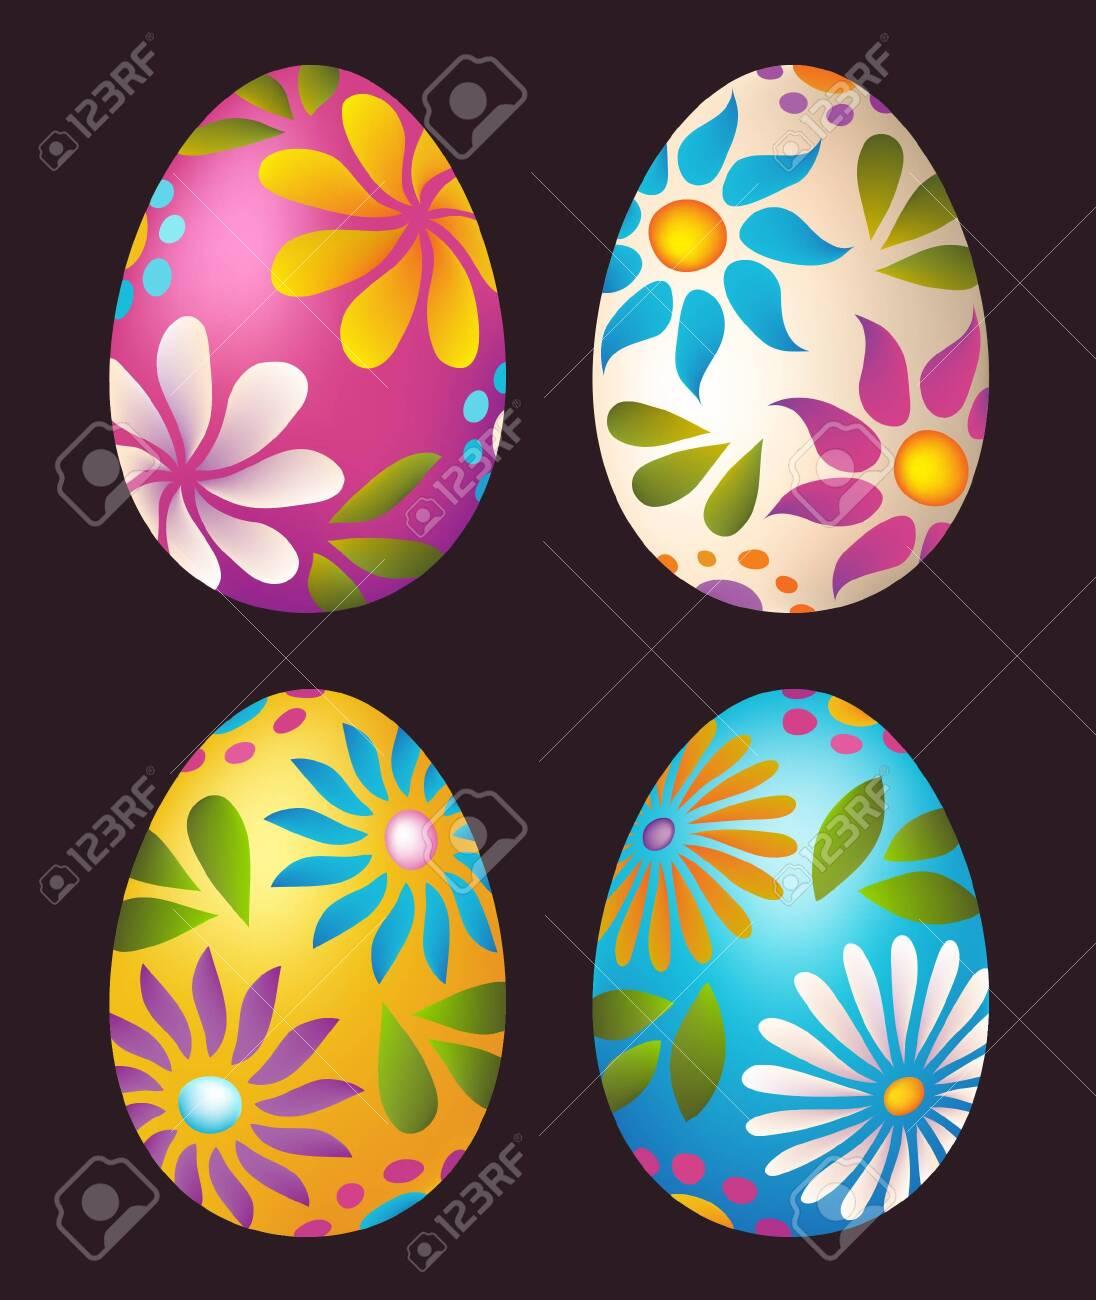 Easter Eggs floral colorful design - 110725916